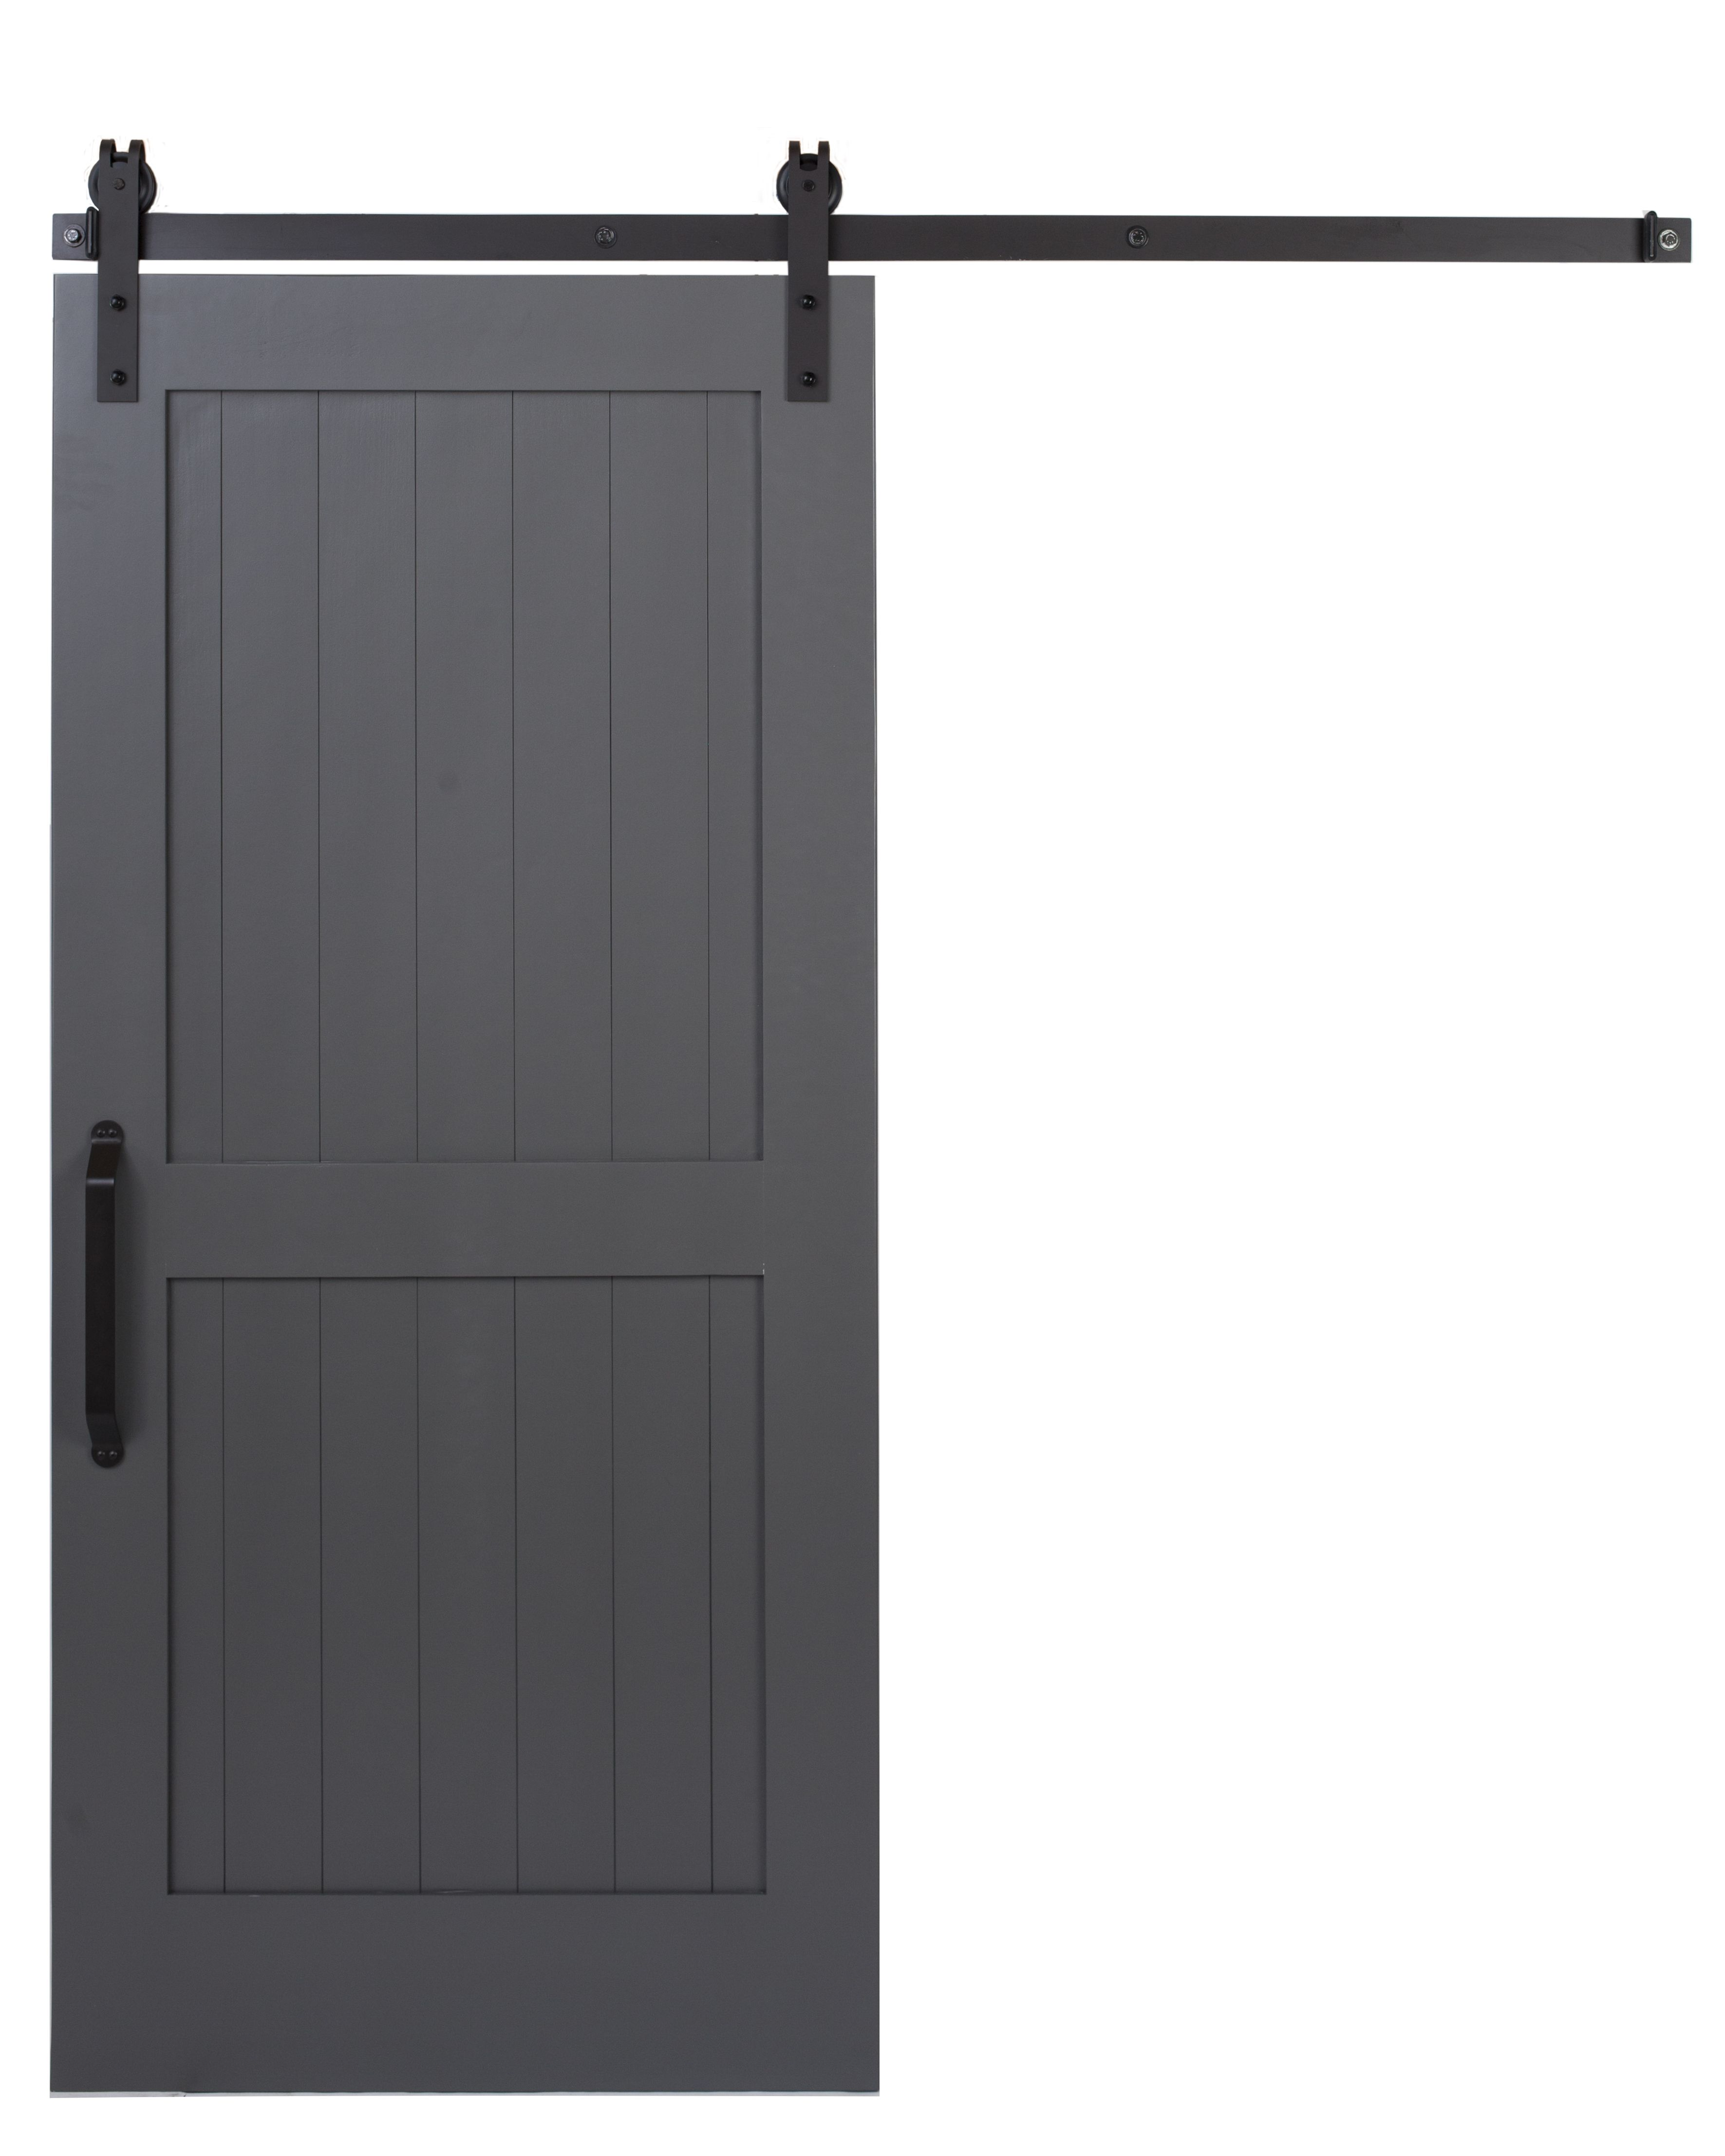 gunmetal gray two panel sliding barn door by rustica hardware